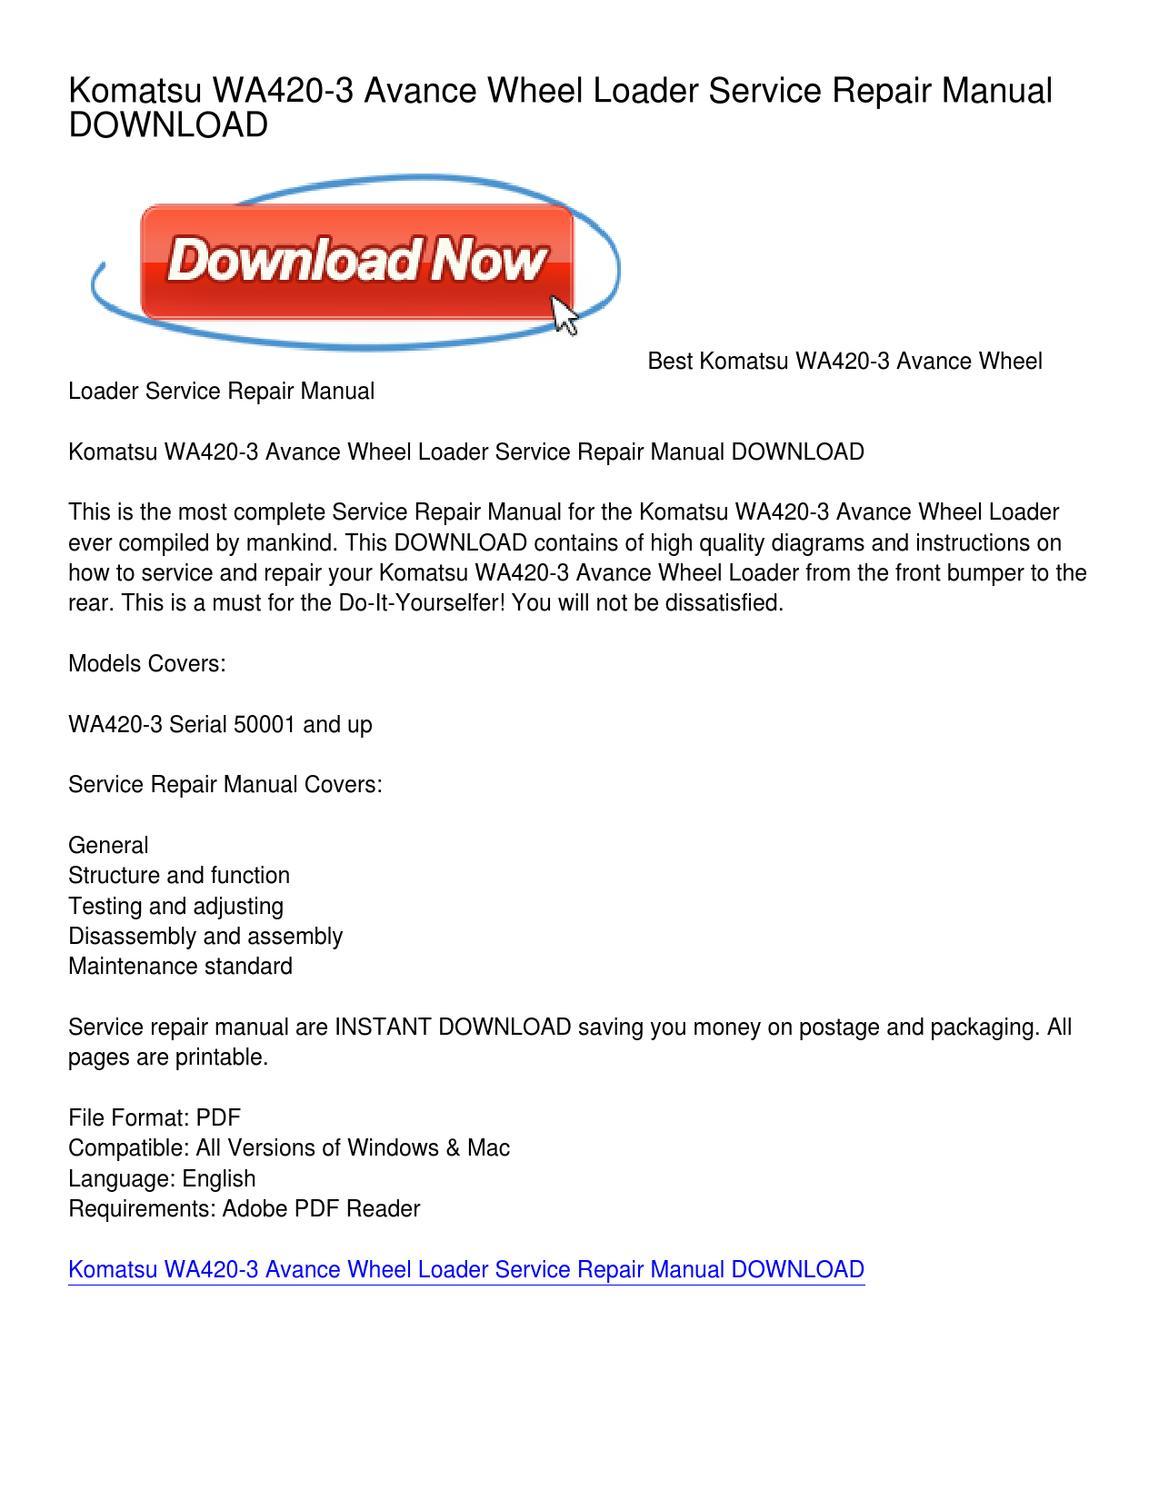 Komatsu WA420-3 Avance Wheel Loader Service Repair Manual DOWNLOAD by  William Nielsen - issuu